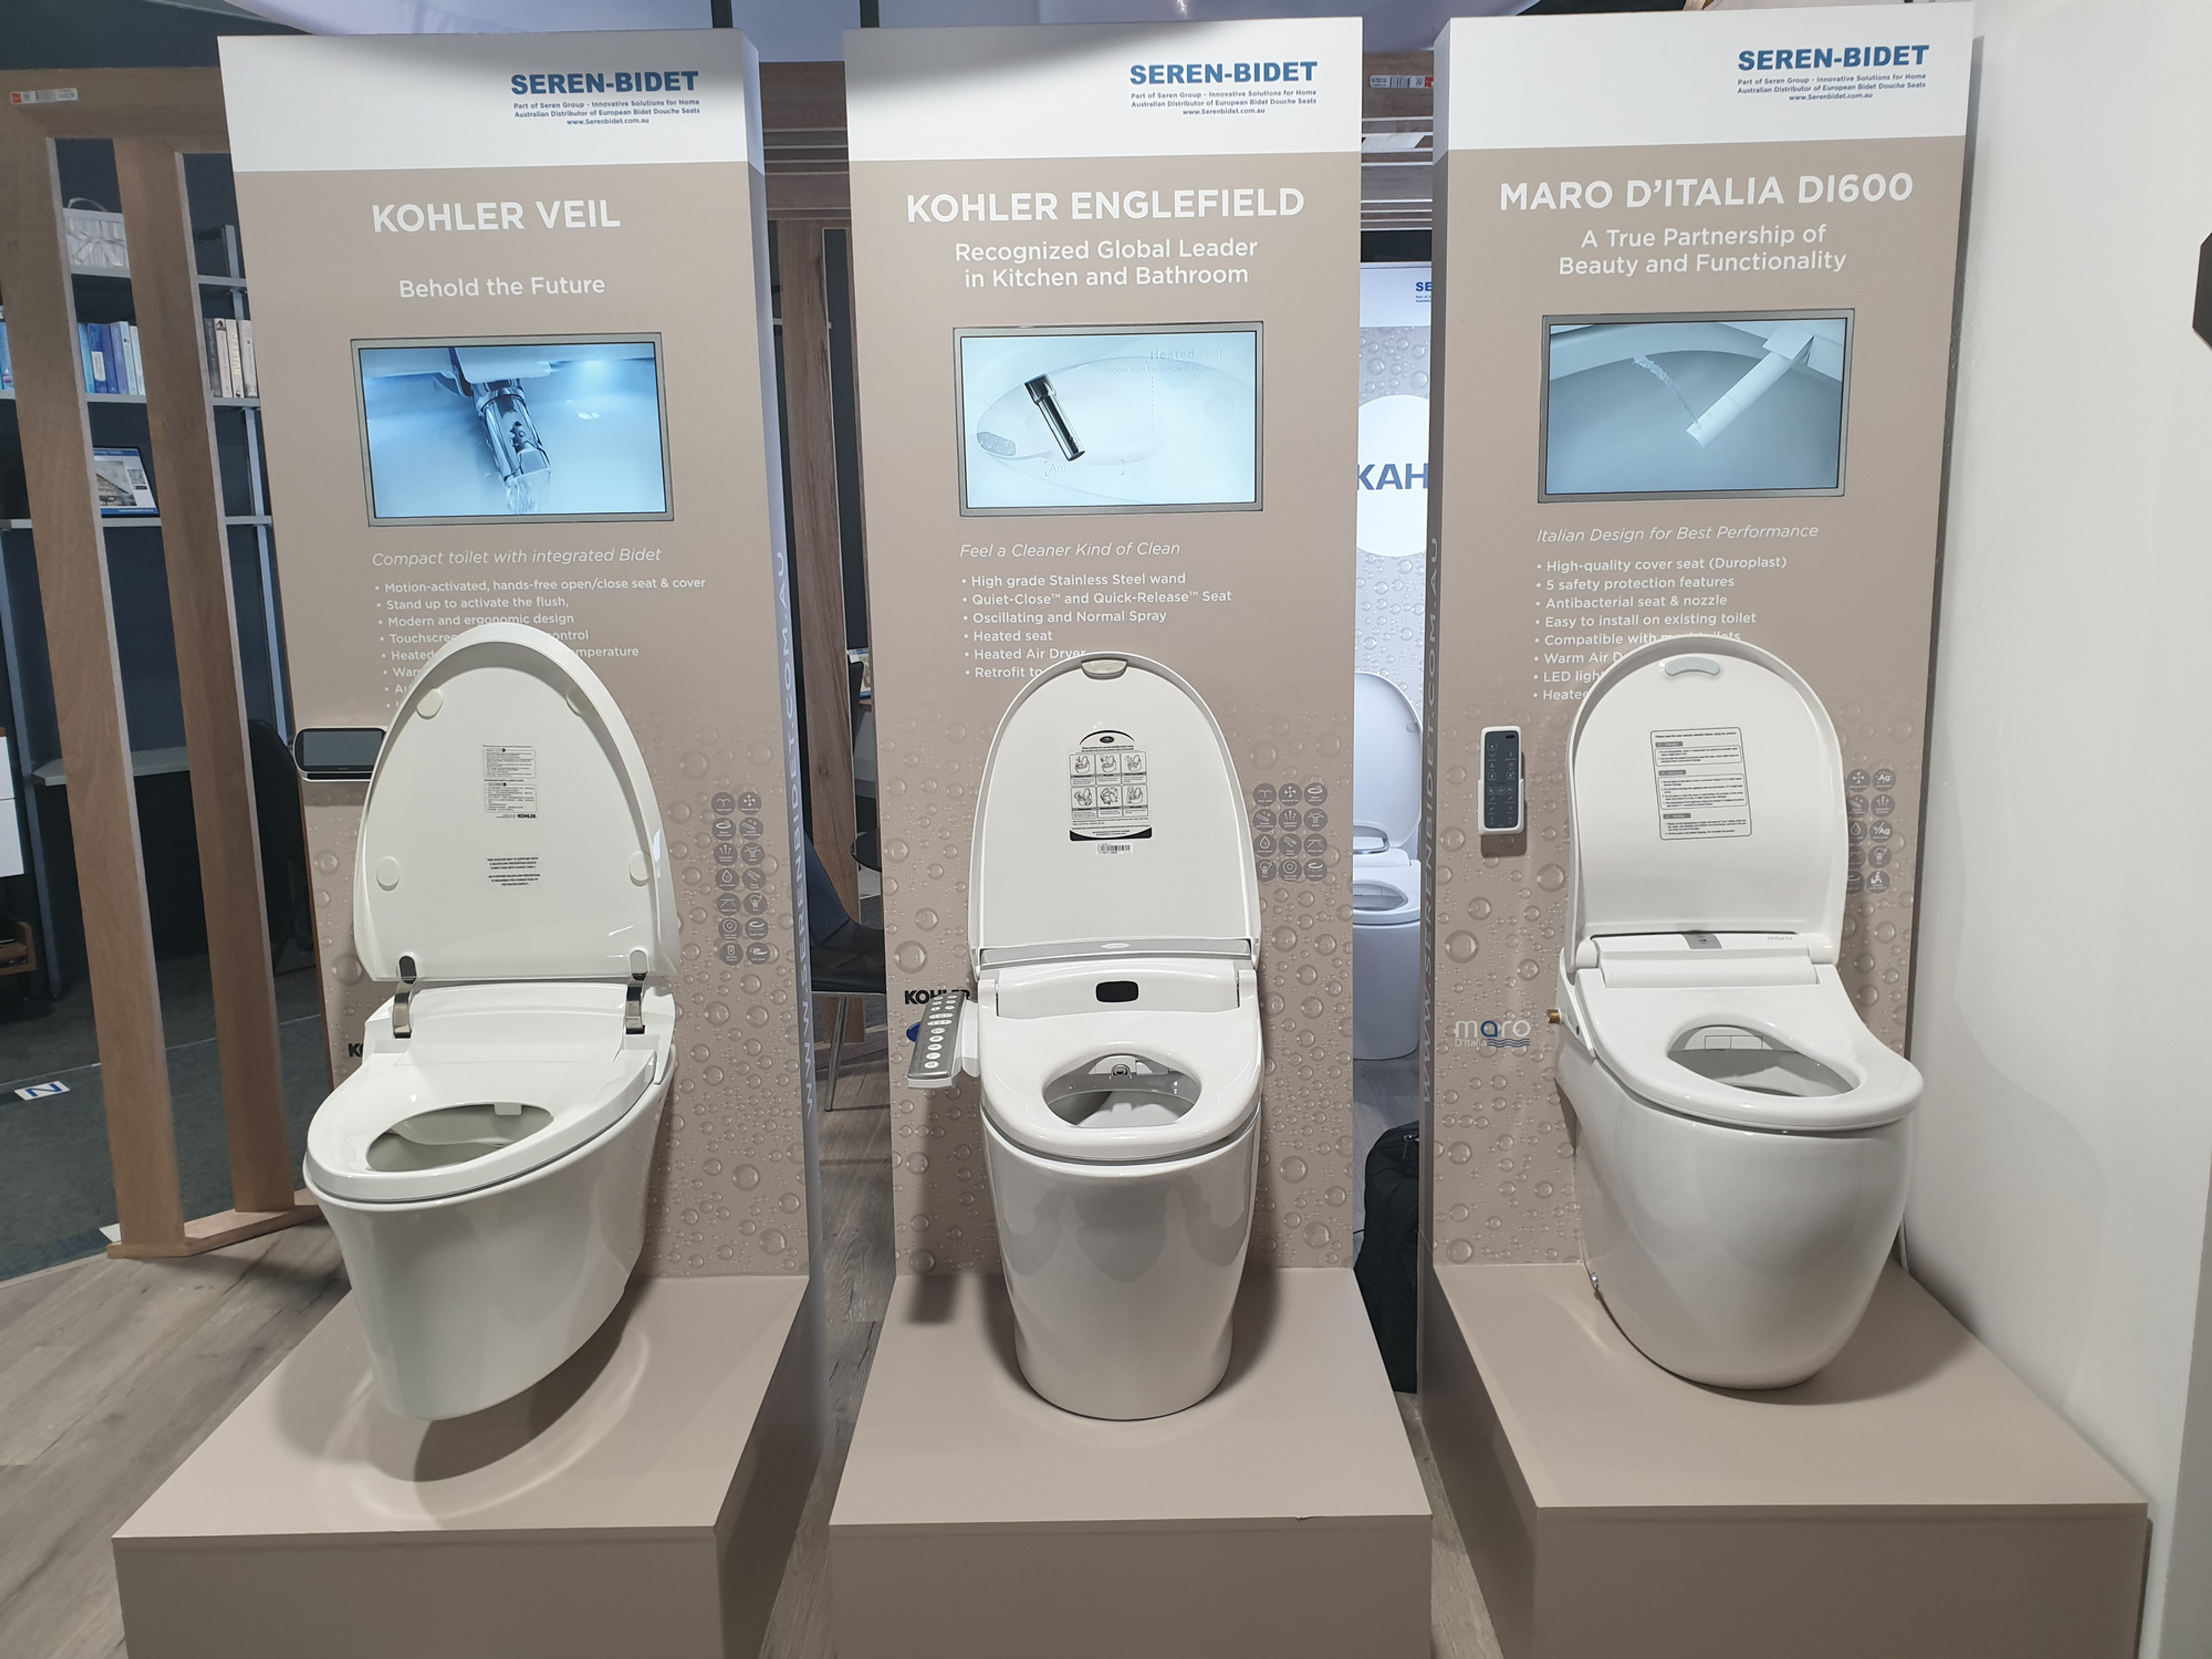 Seren Bidet Japanese Toilet Bidet Seat Australia